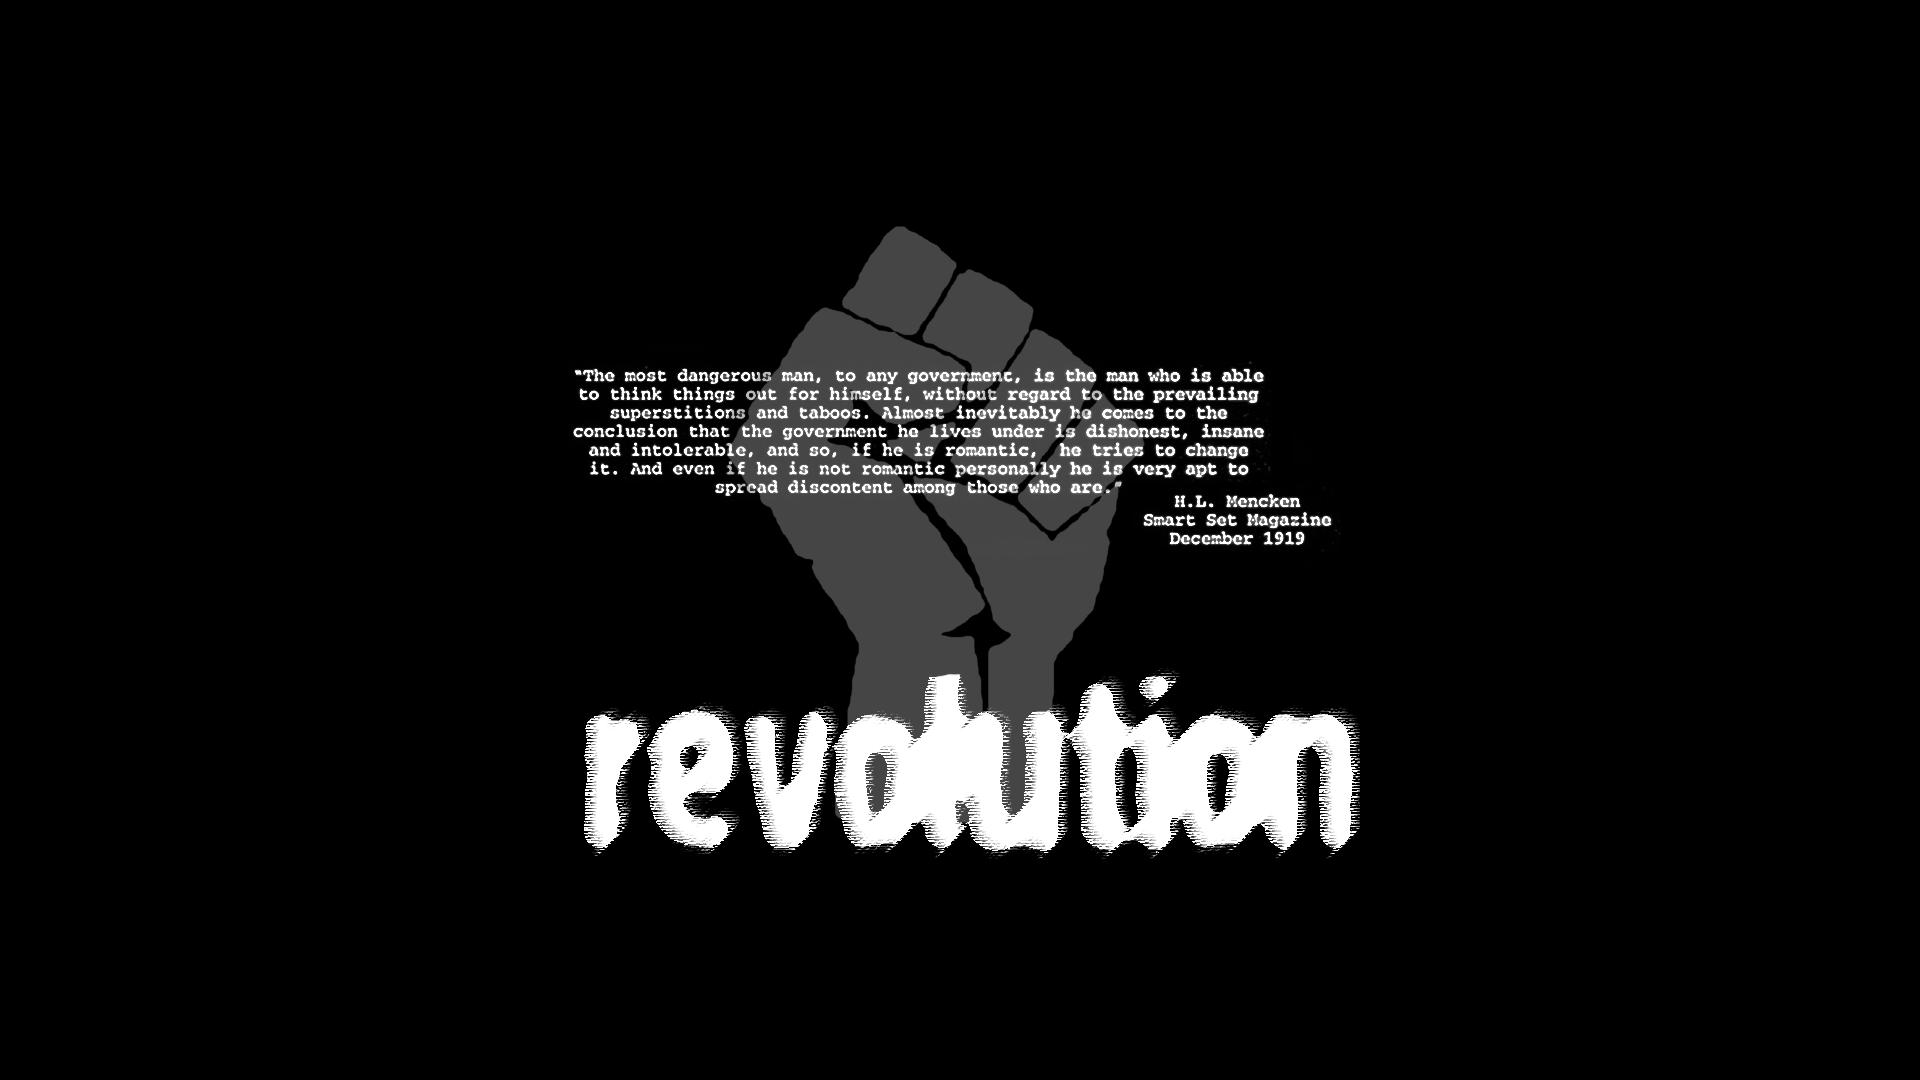 Revolution quote #2